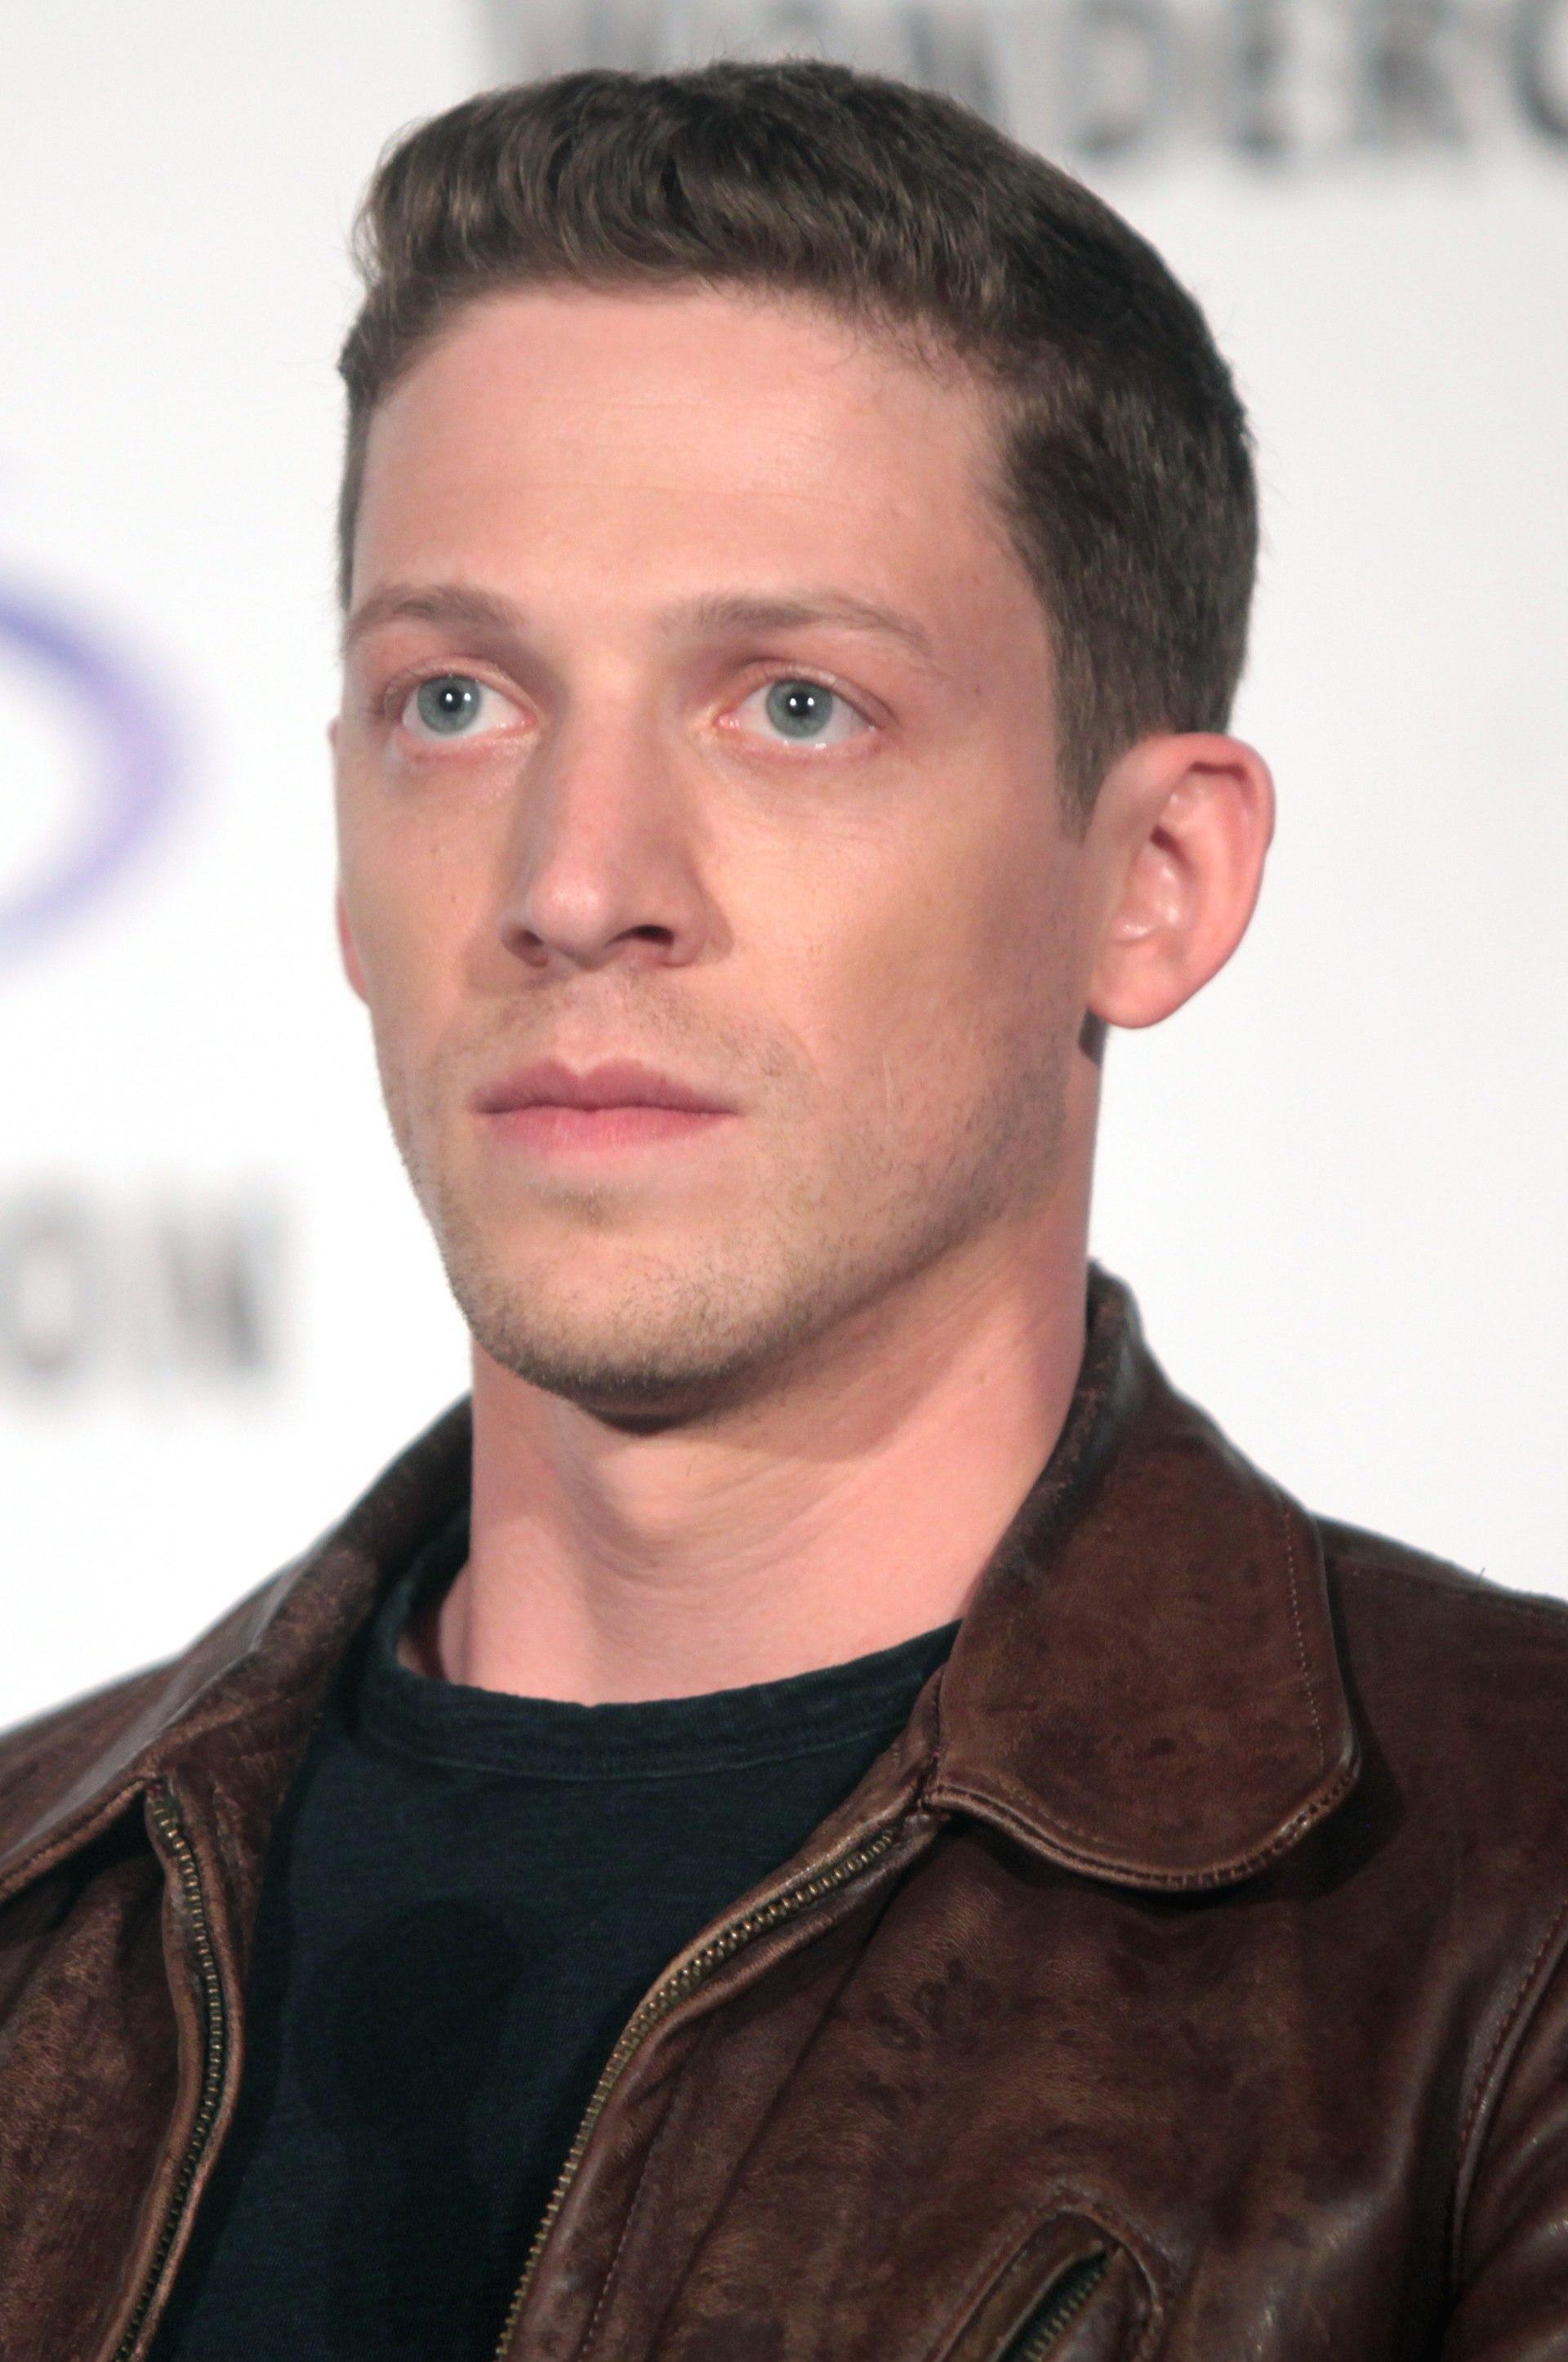 Zach Appelman - All Celebrity Wiki